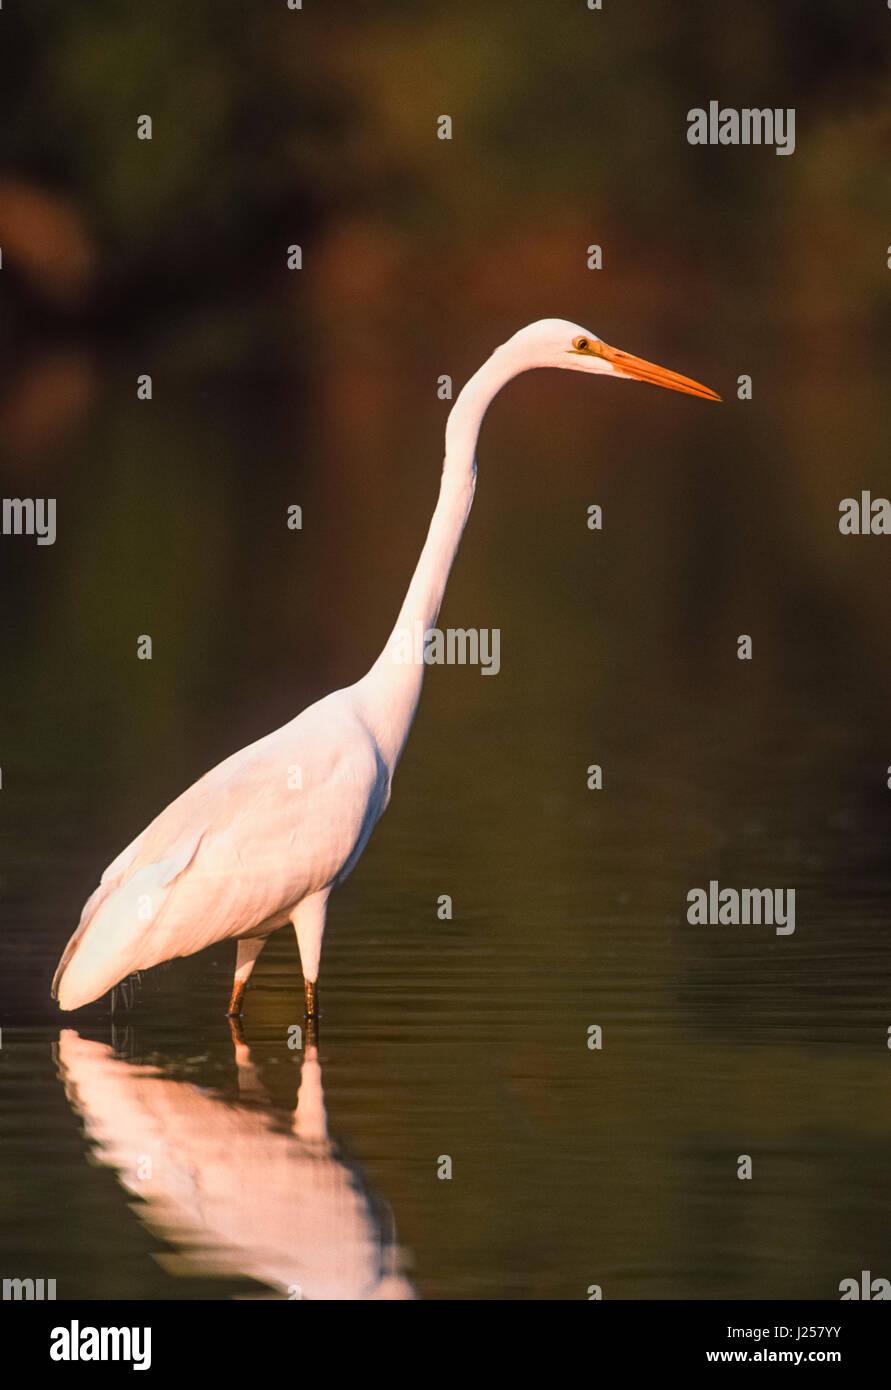 Great Egret, (Ardea alba), fishing in wetlands, Keoladeo Ghan National Park, Bharatpur, Rajasthan, India - Stock Image